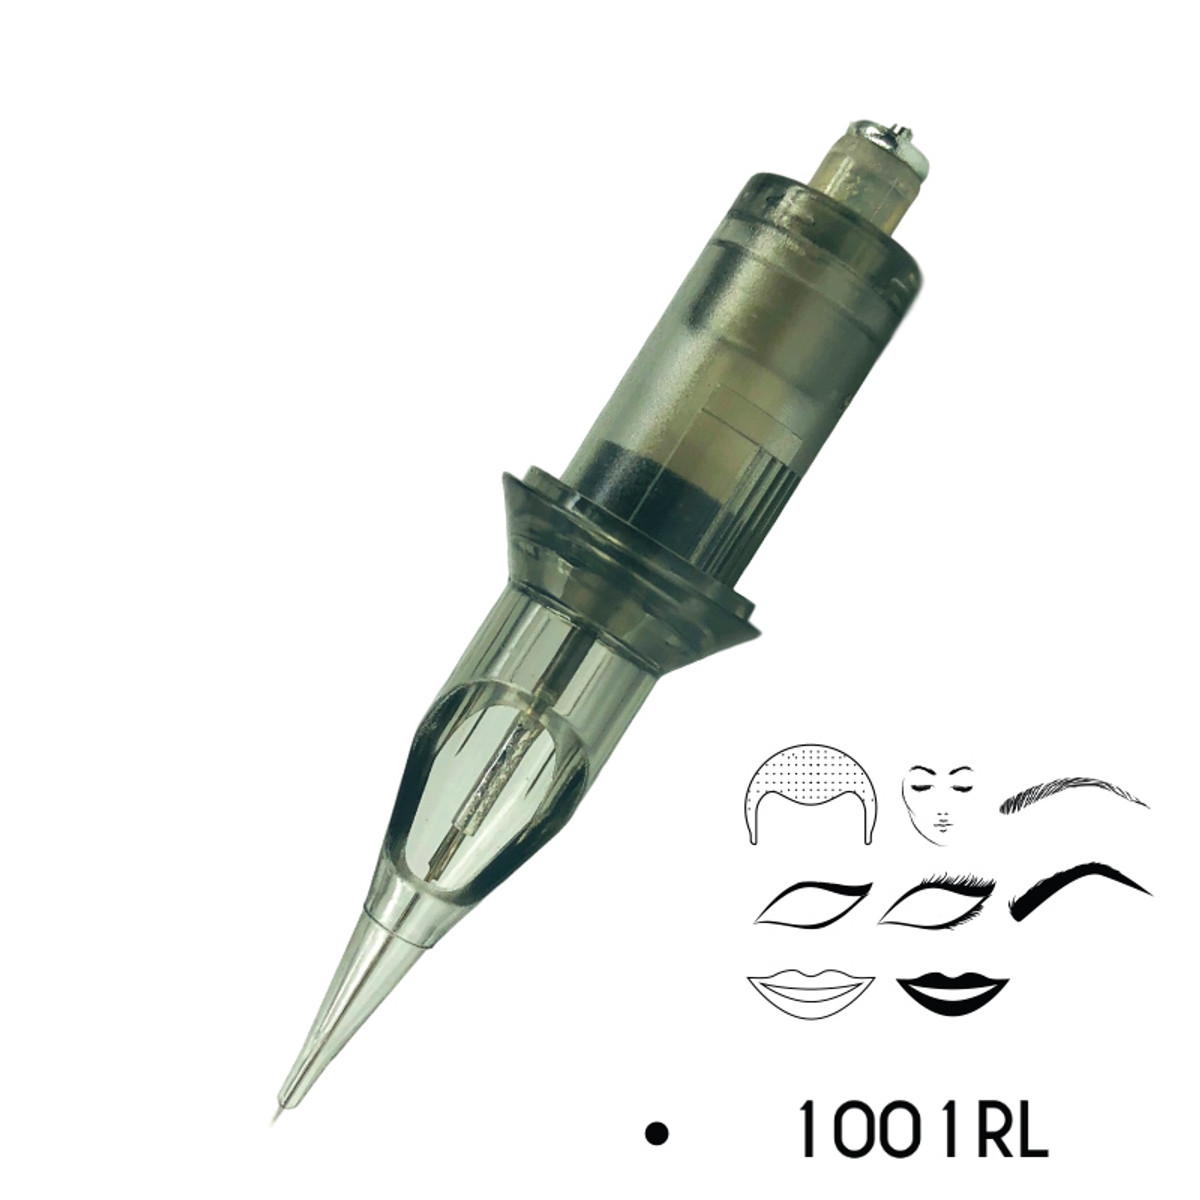 Dermo Power Permanent Makeup (PMU) Needle 1001RL